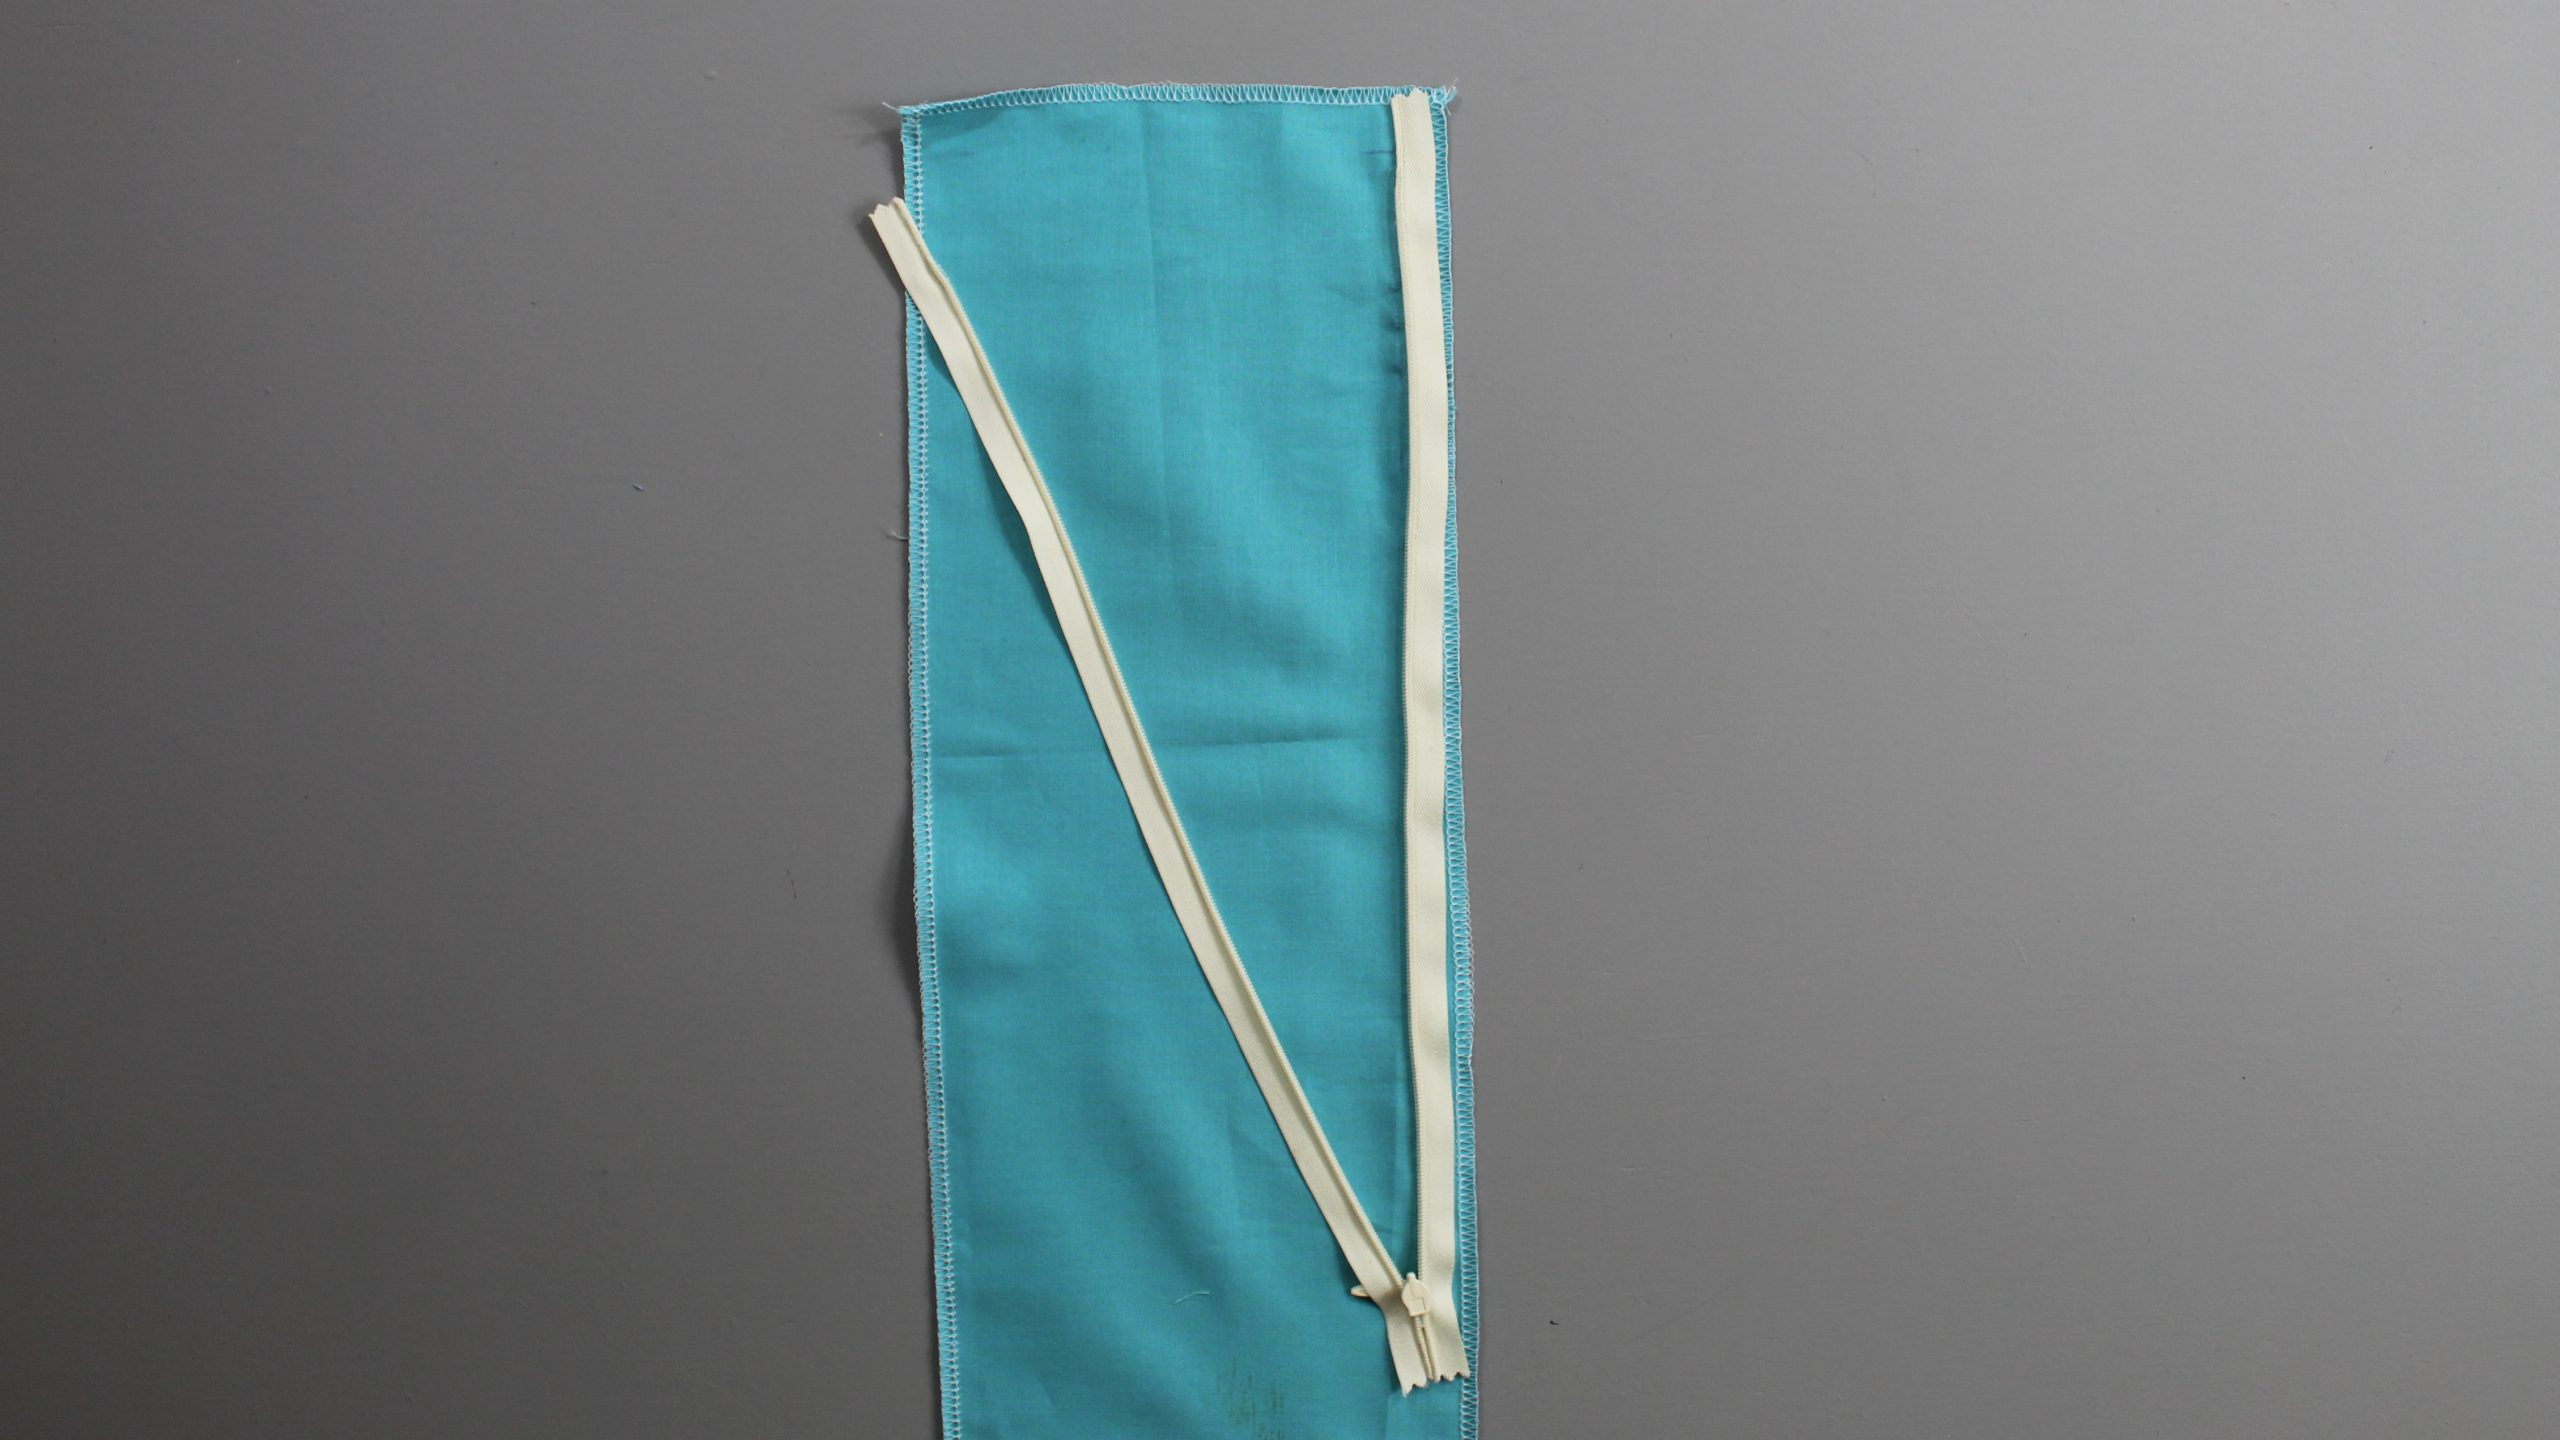 Sewed half of zipper